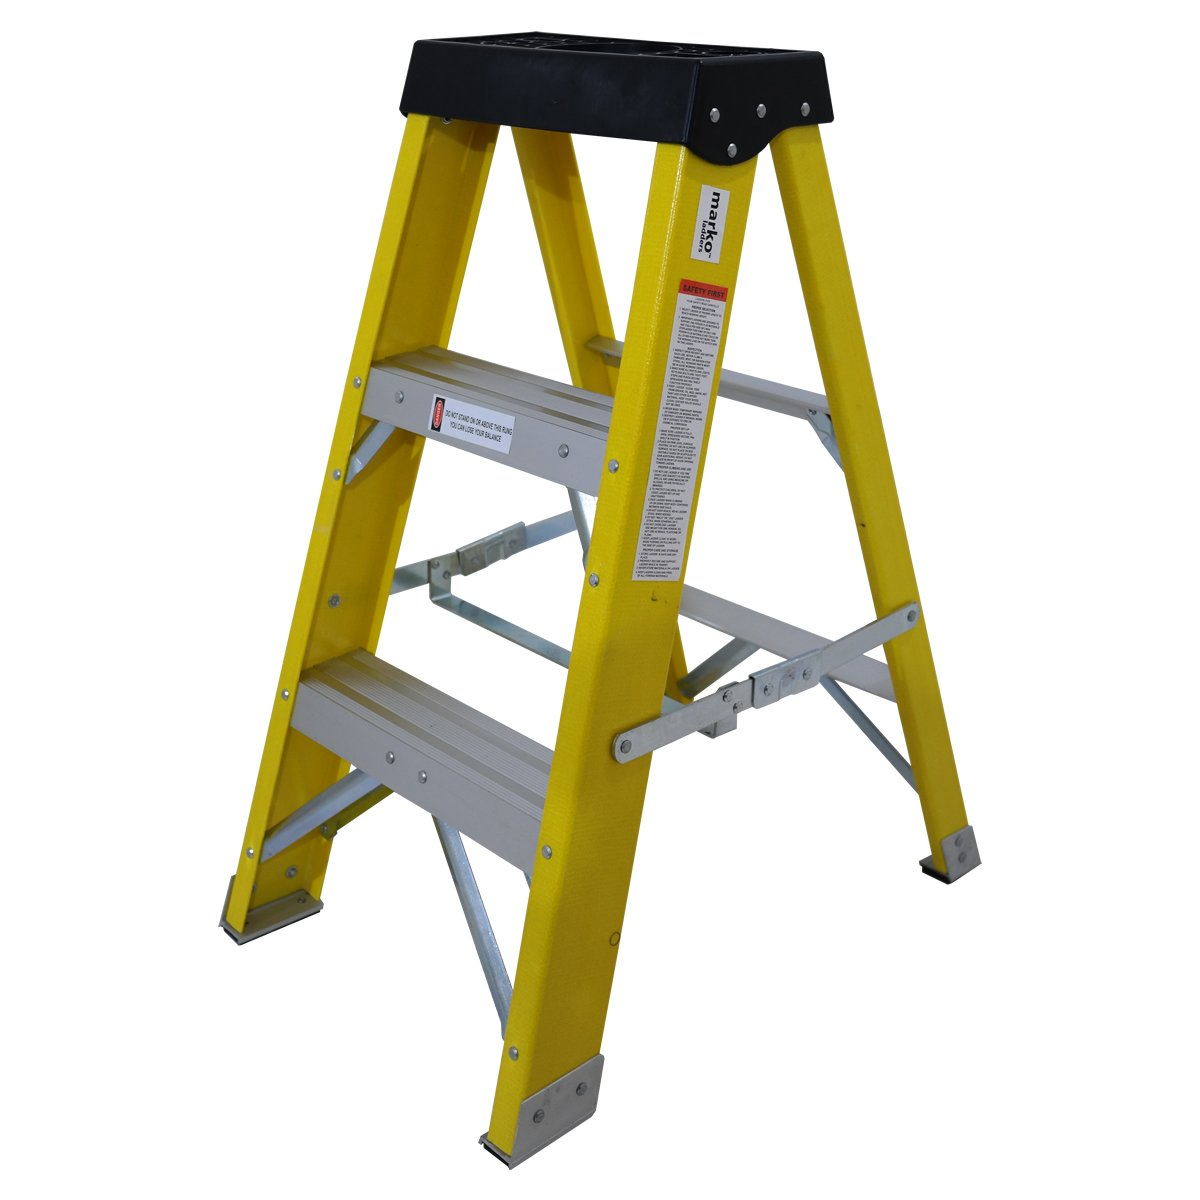 2 + 1 Step Electricians Heavy Duty Fibreglass Step Ladder 30000V Tread Fibre Amazon.co.uk DIY u0026 Tools  sc 1 st  Amazon UK & 2 + 1 Step Electricians Heavy Duty Fibreglass Step Ladder 30000V ... islam-shia.org